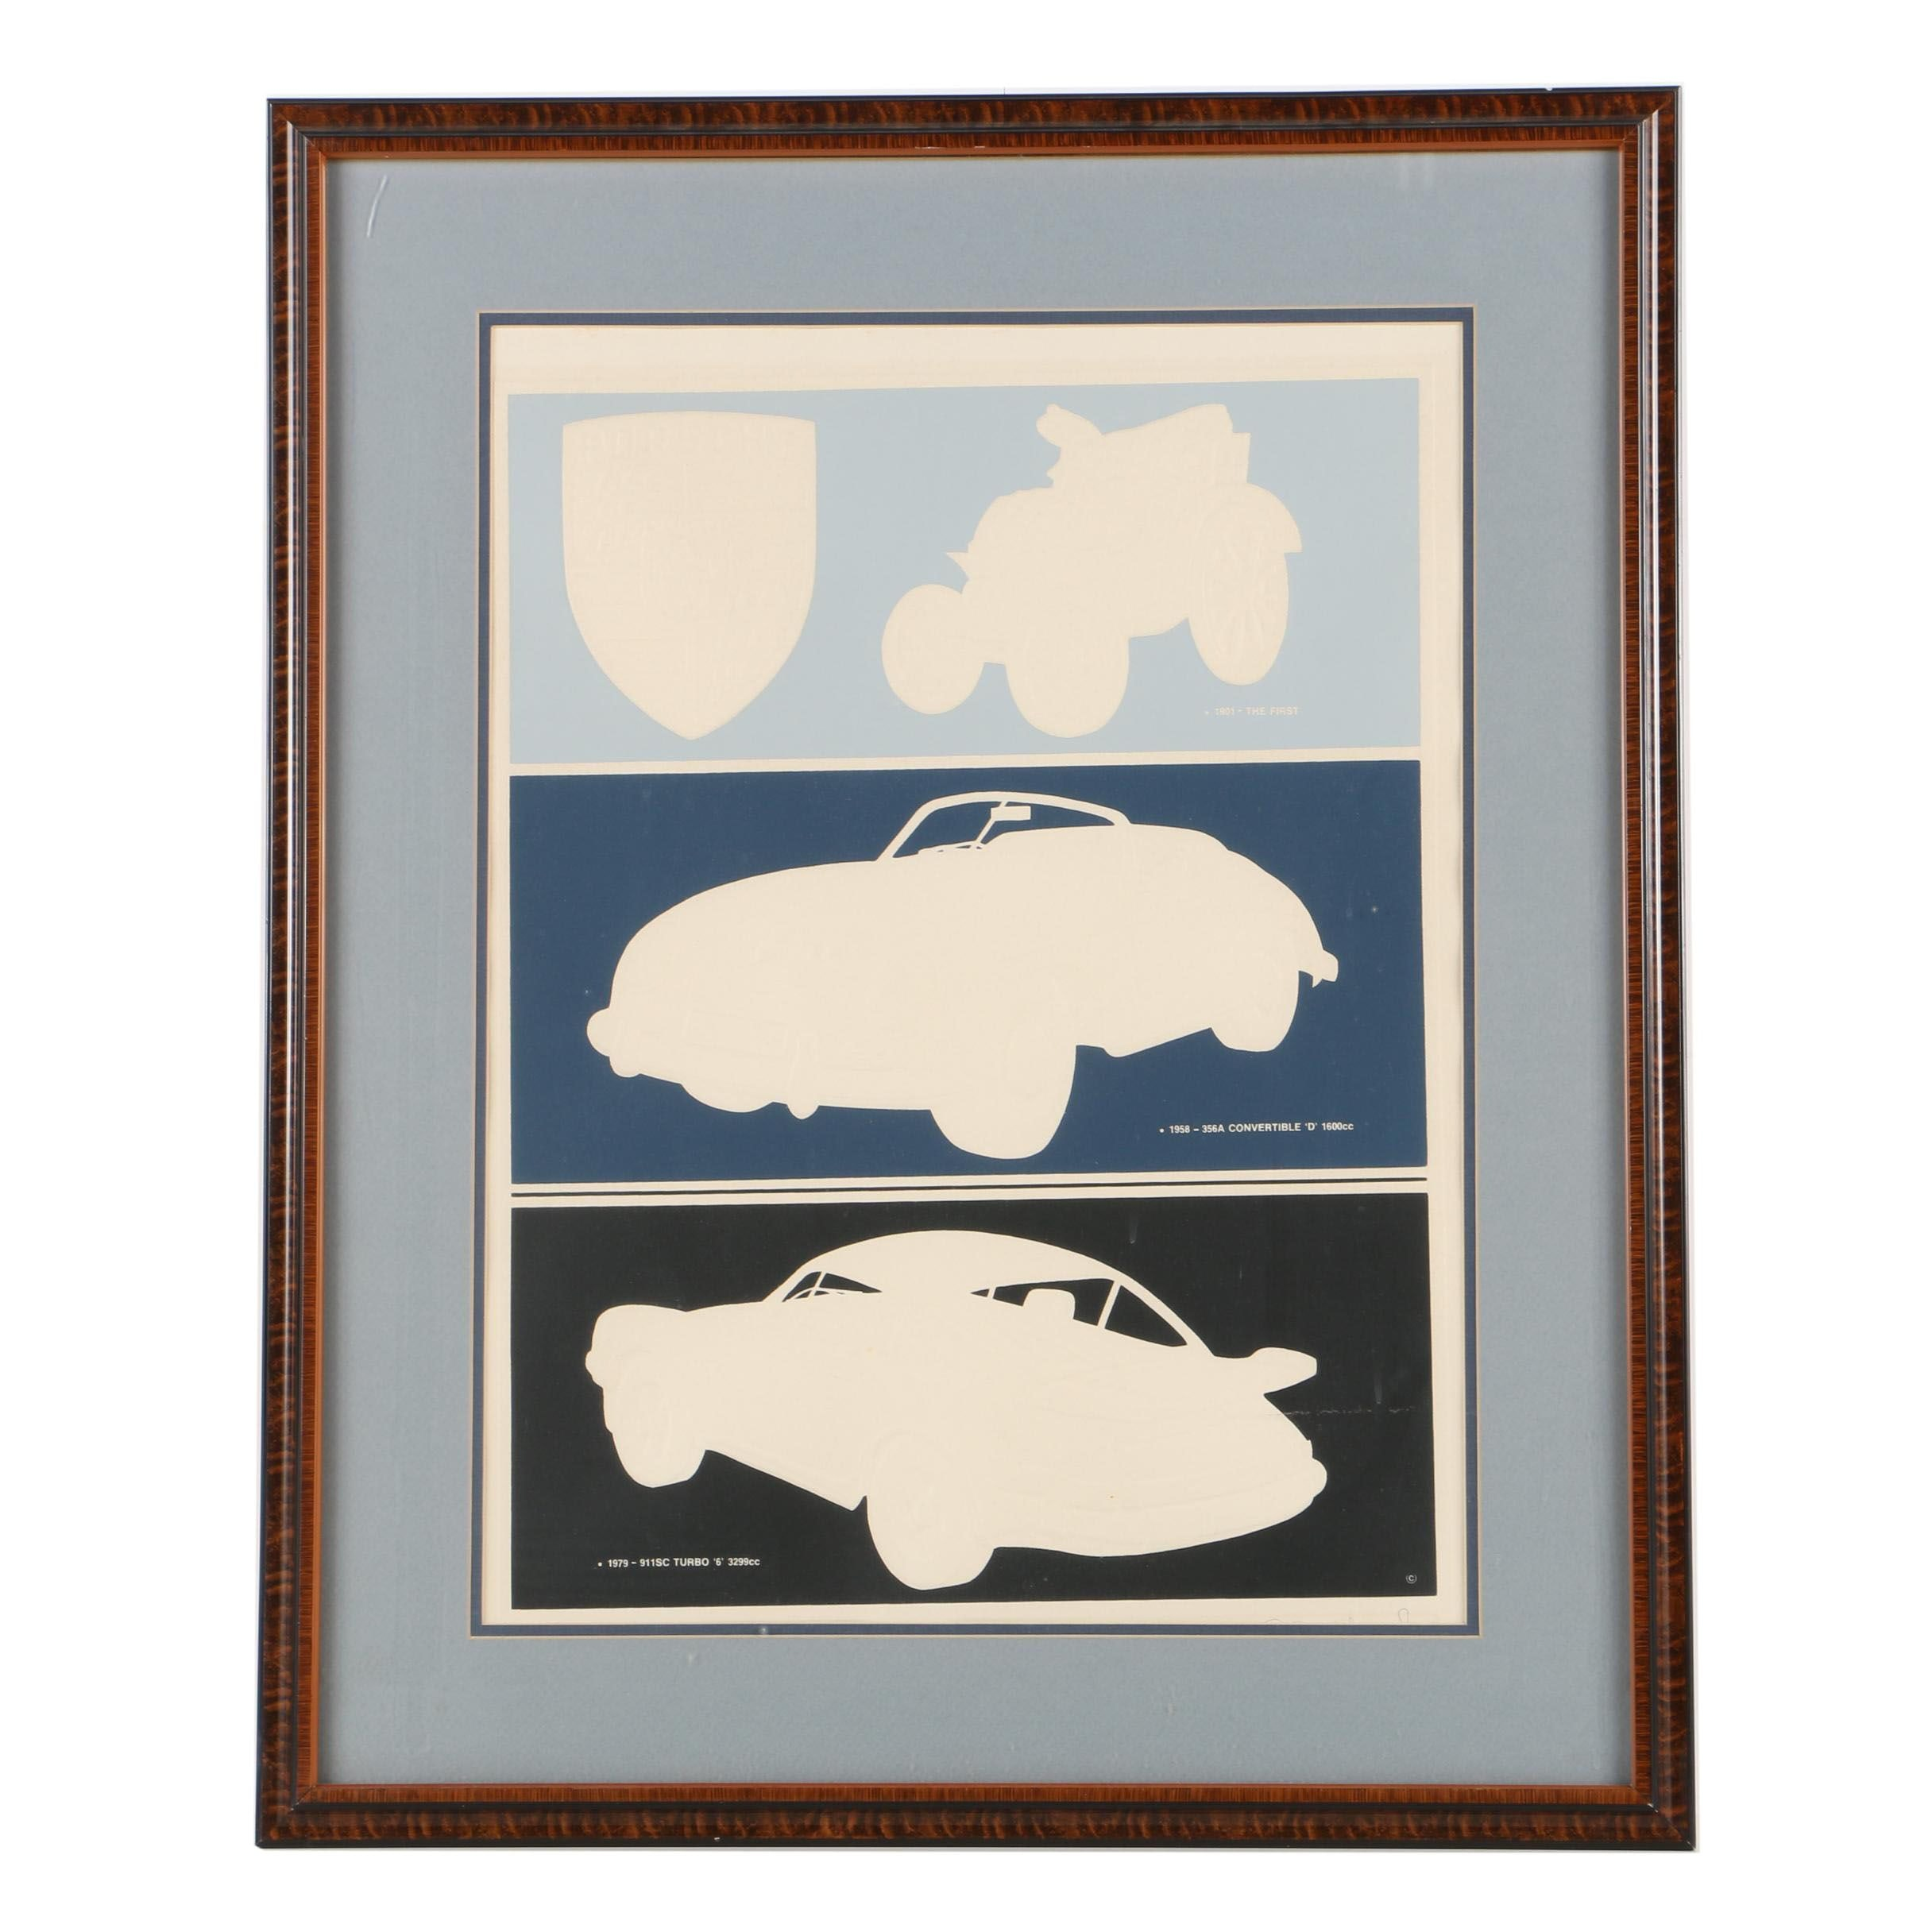 Serigraph Print on Embossed Paper of Porsche Car Models